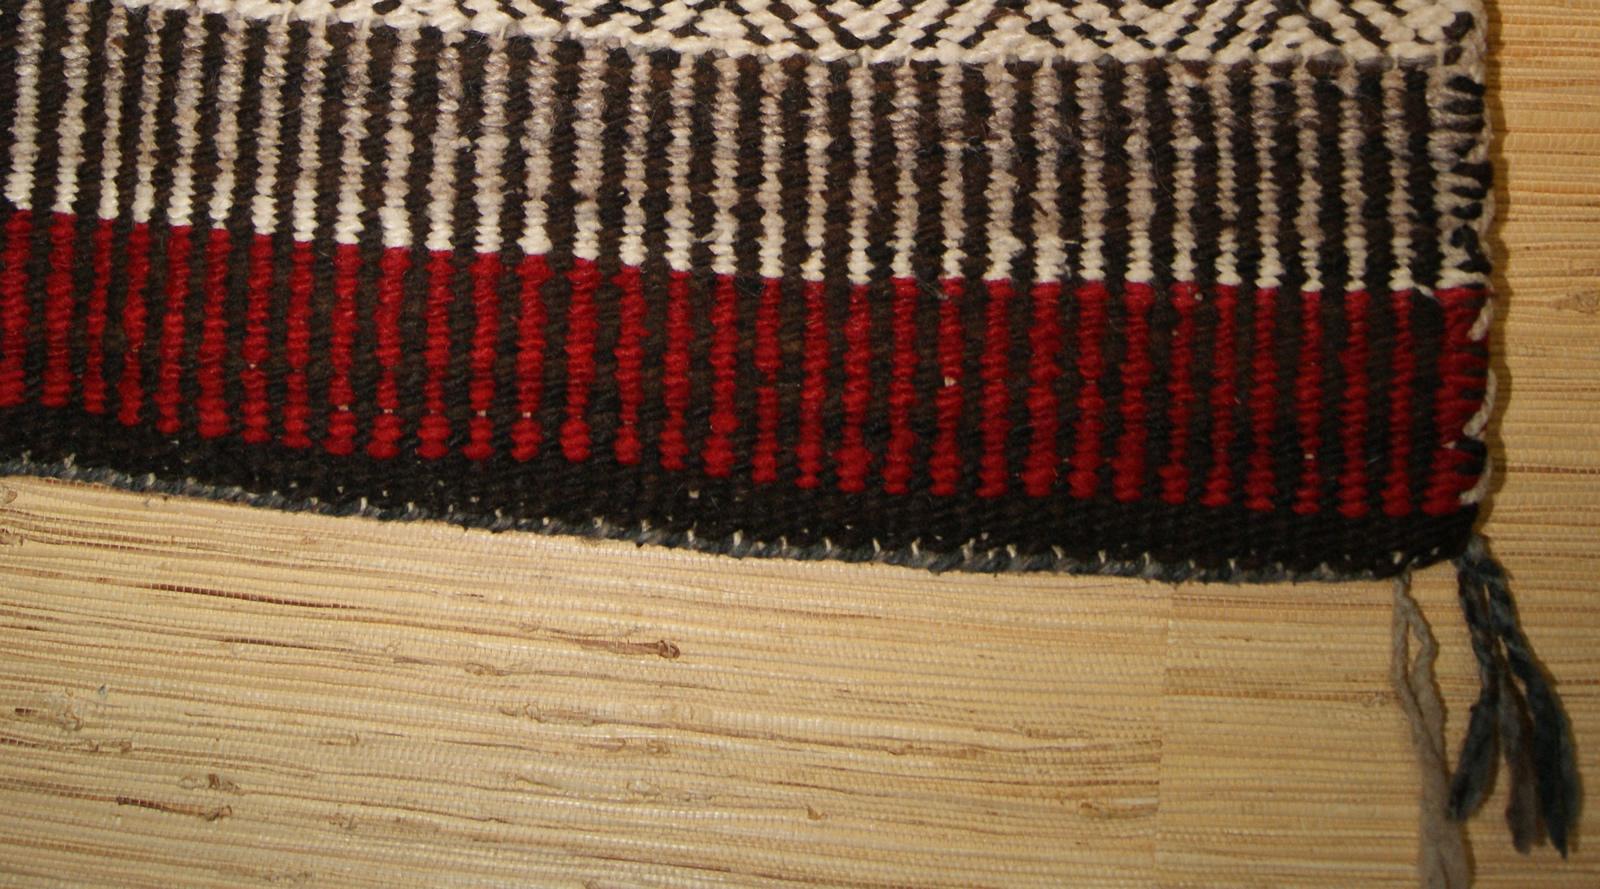 Twill Weave Navajo Single Saddle Blanket